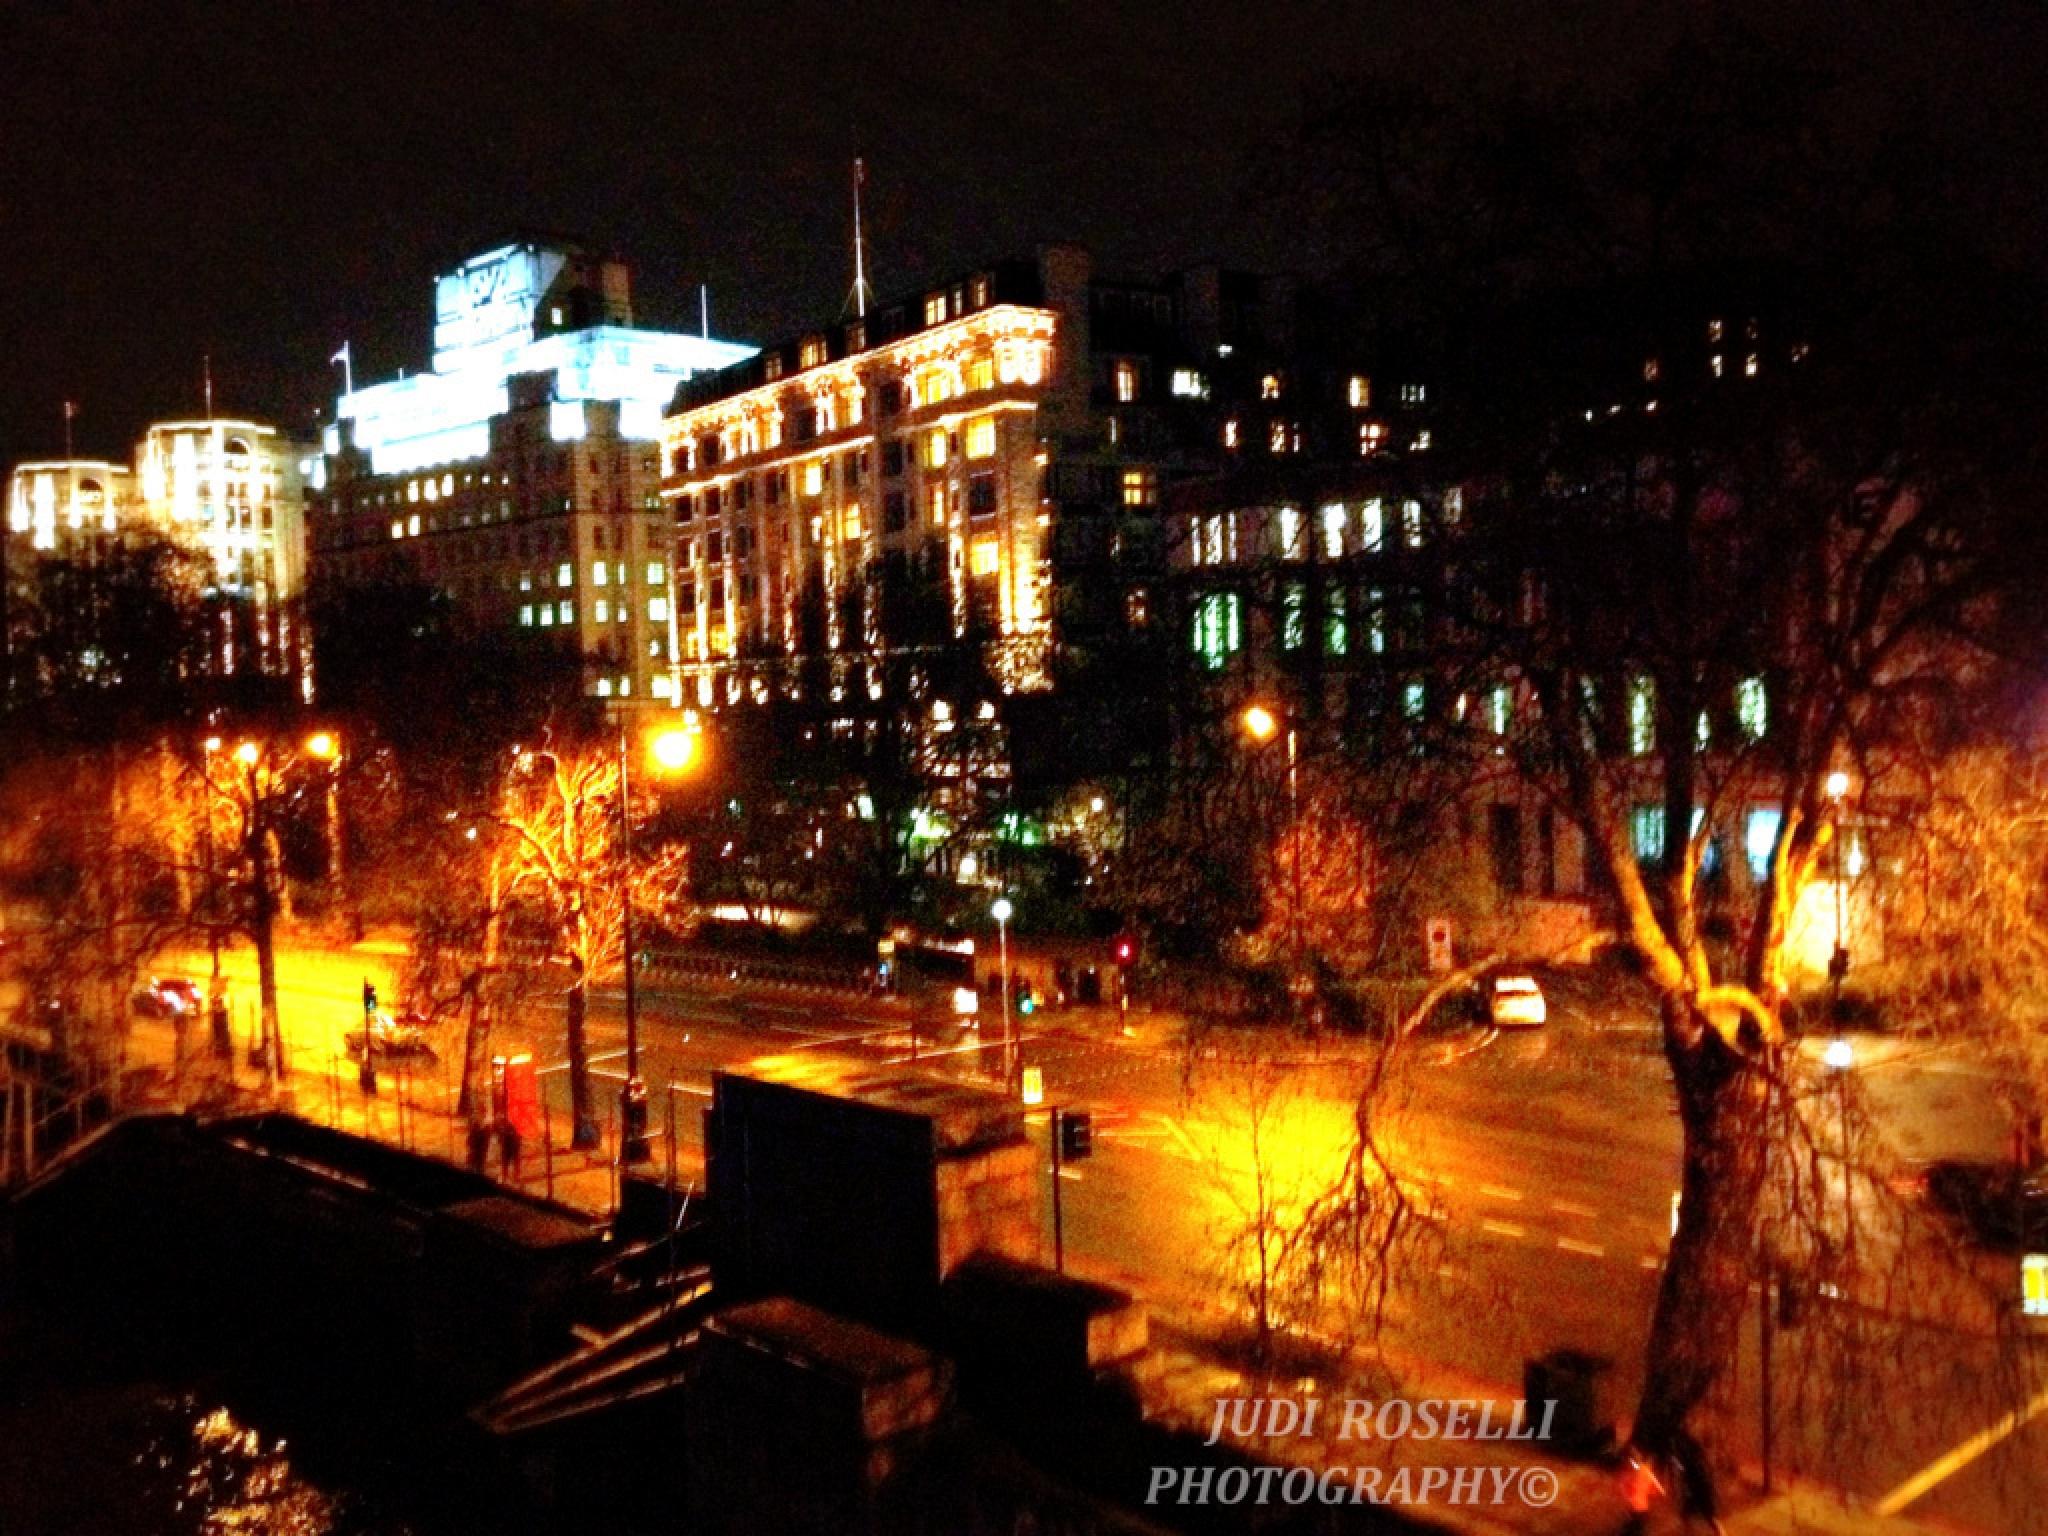 LONDON CITY NIGHTS by JUDI ROSELLI